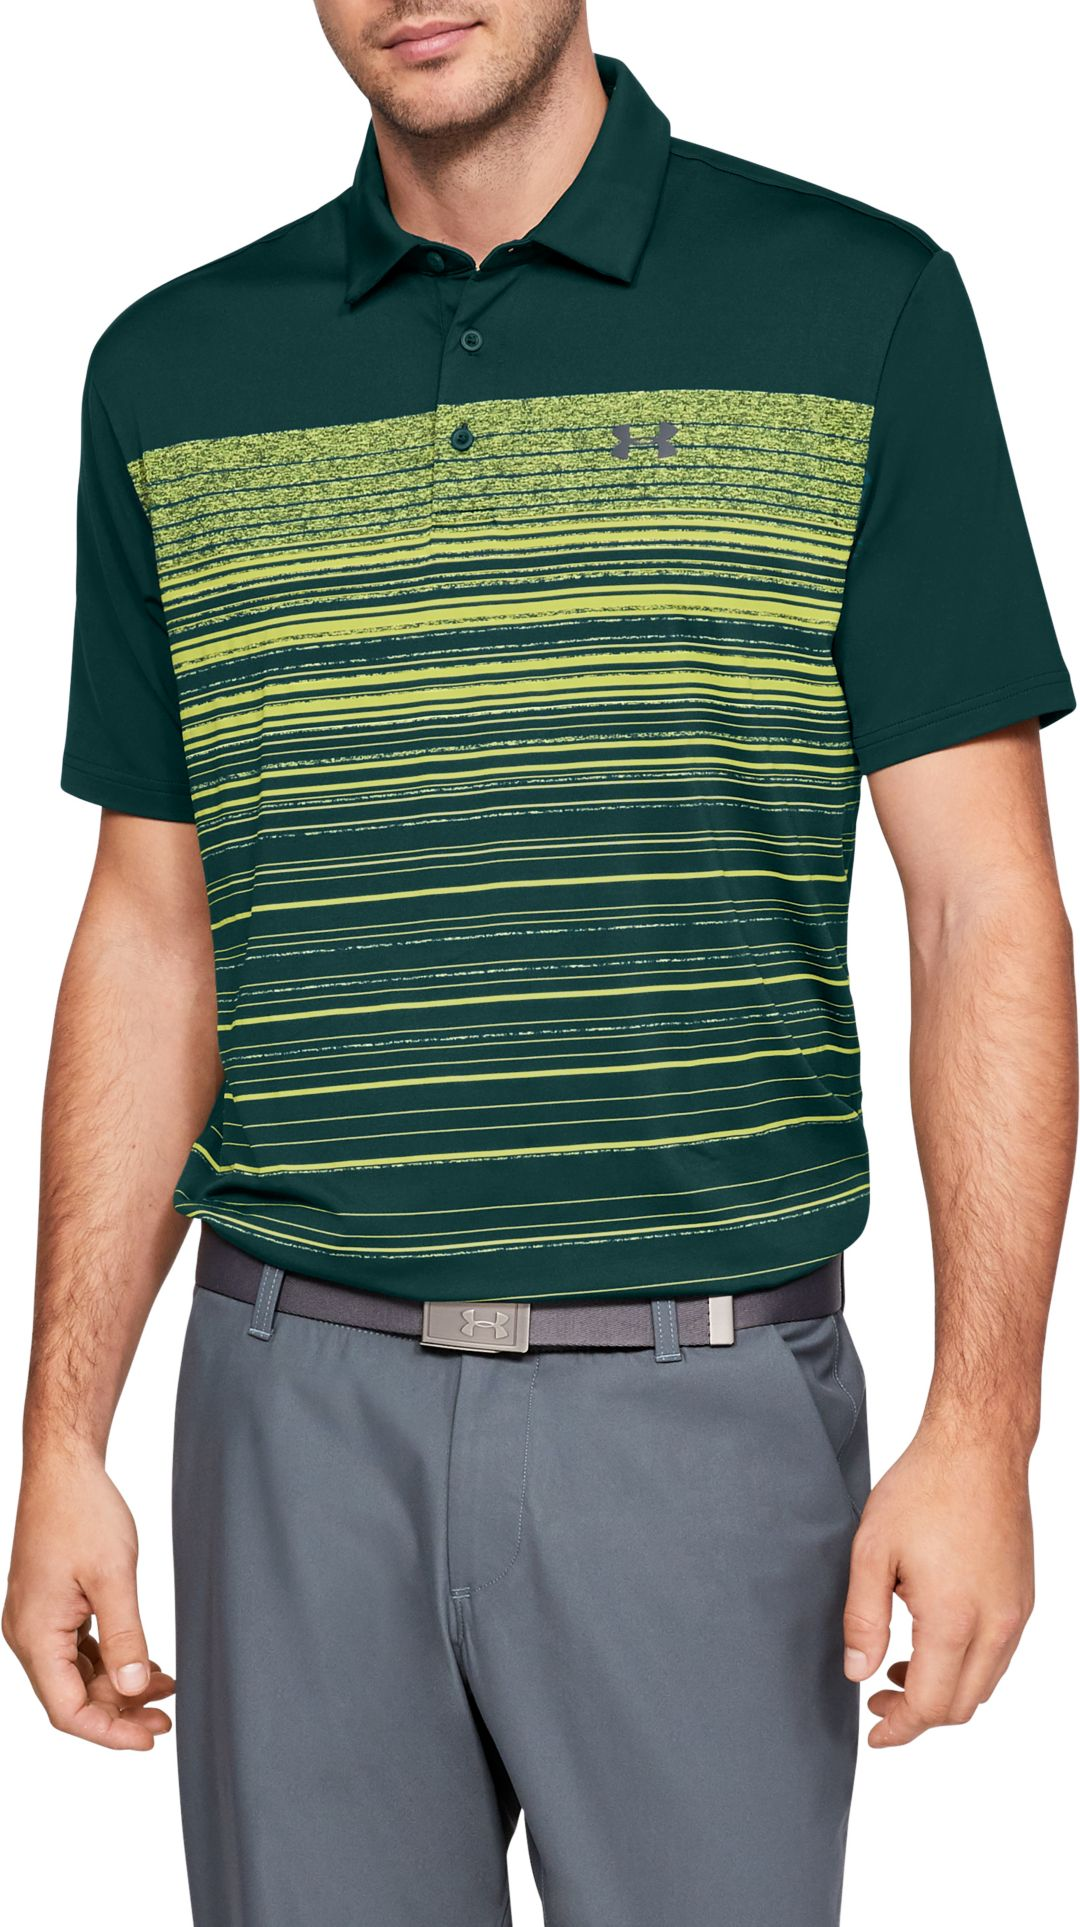 4890c3793f Under Armour Men's Playoff 2.0 Daybreak Stripe Golf Polo